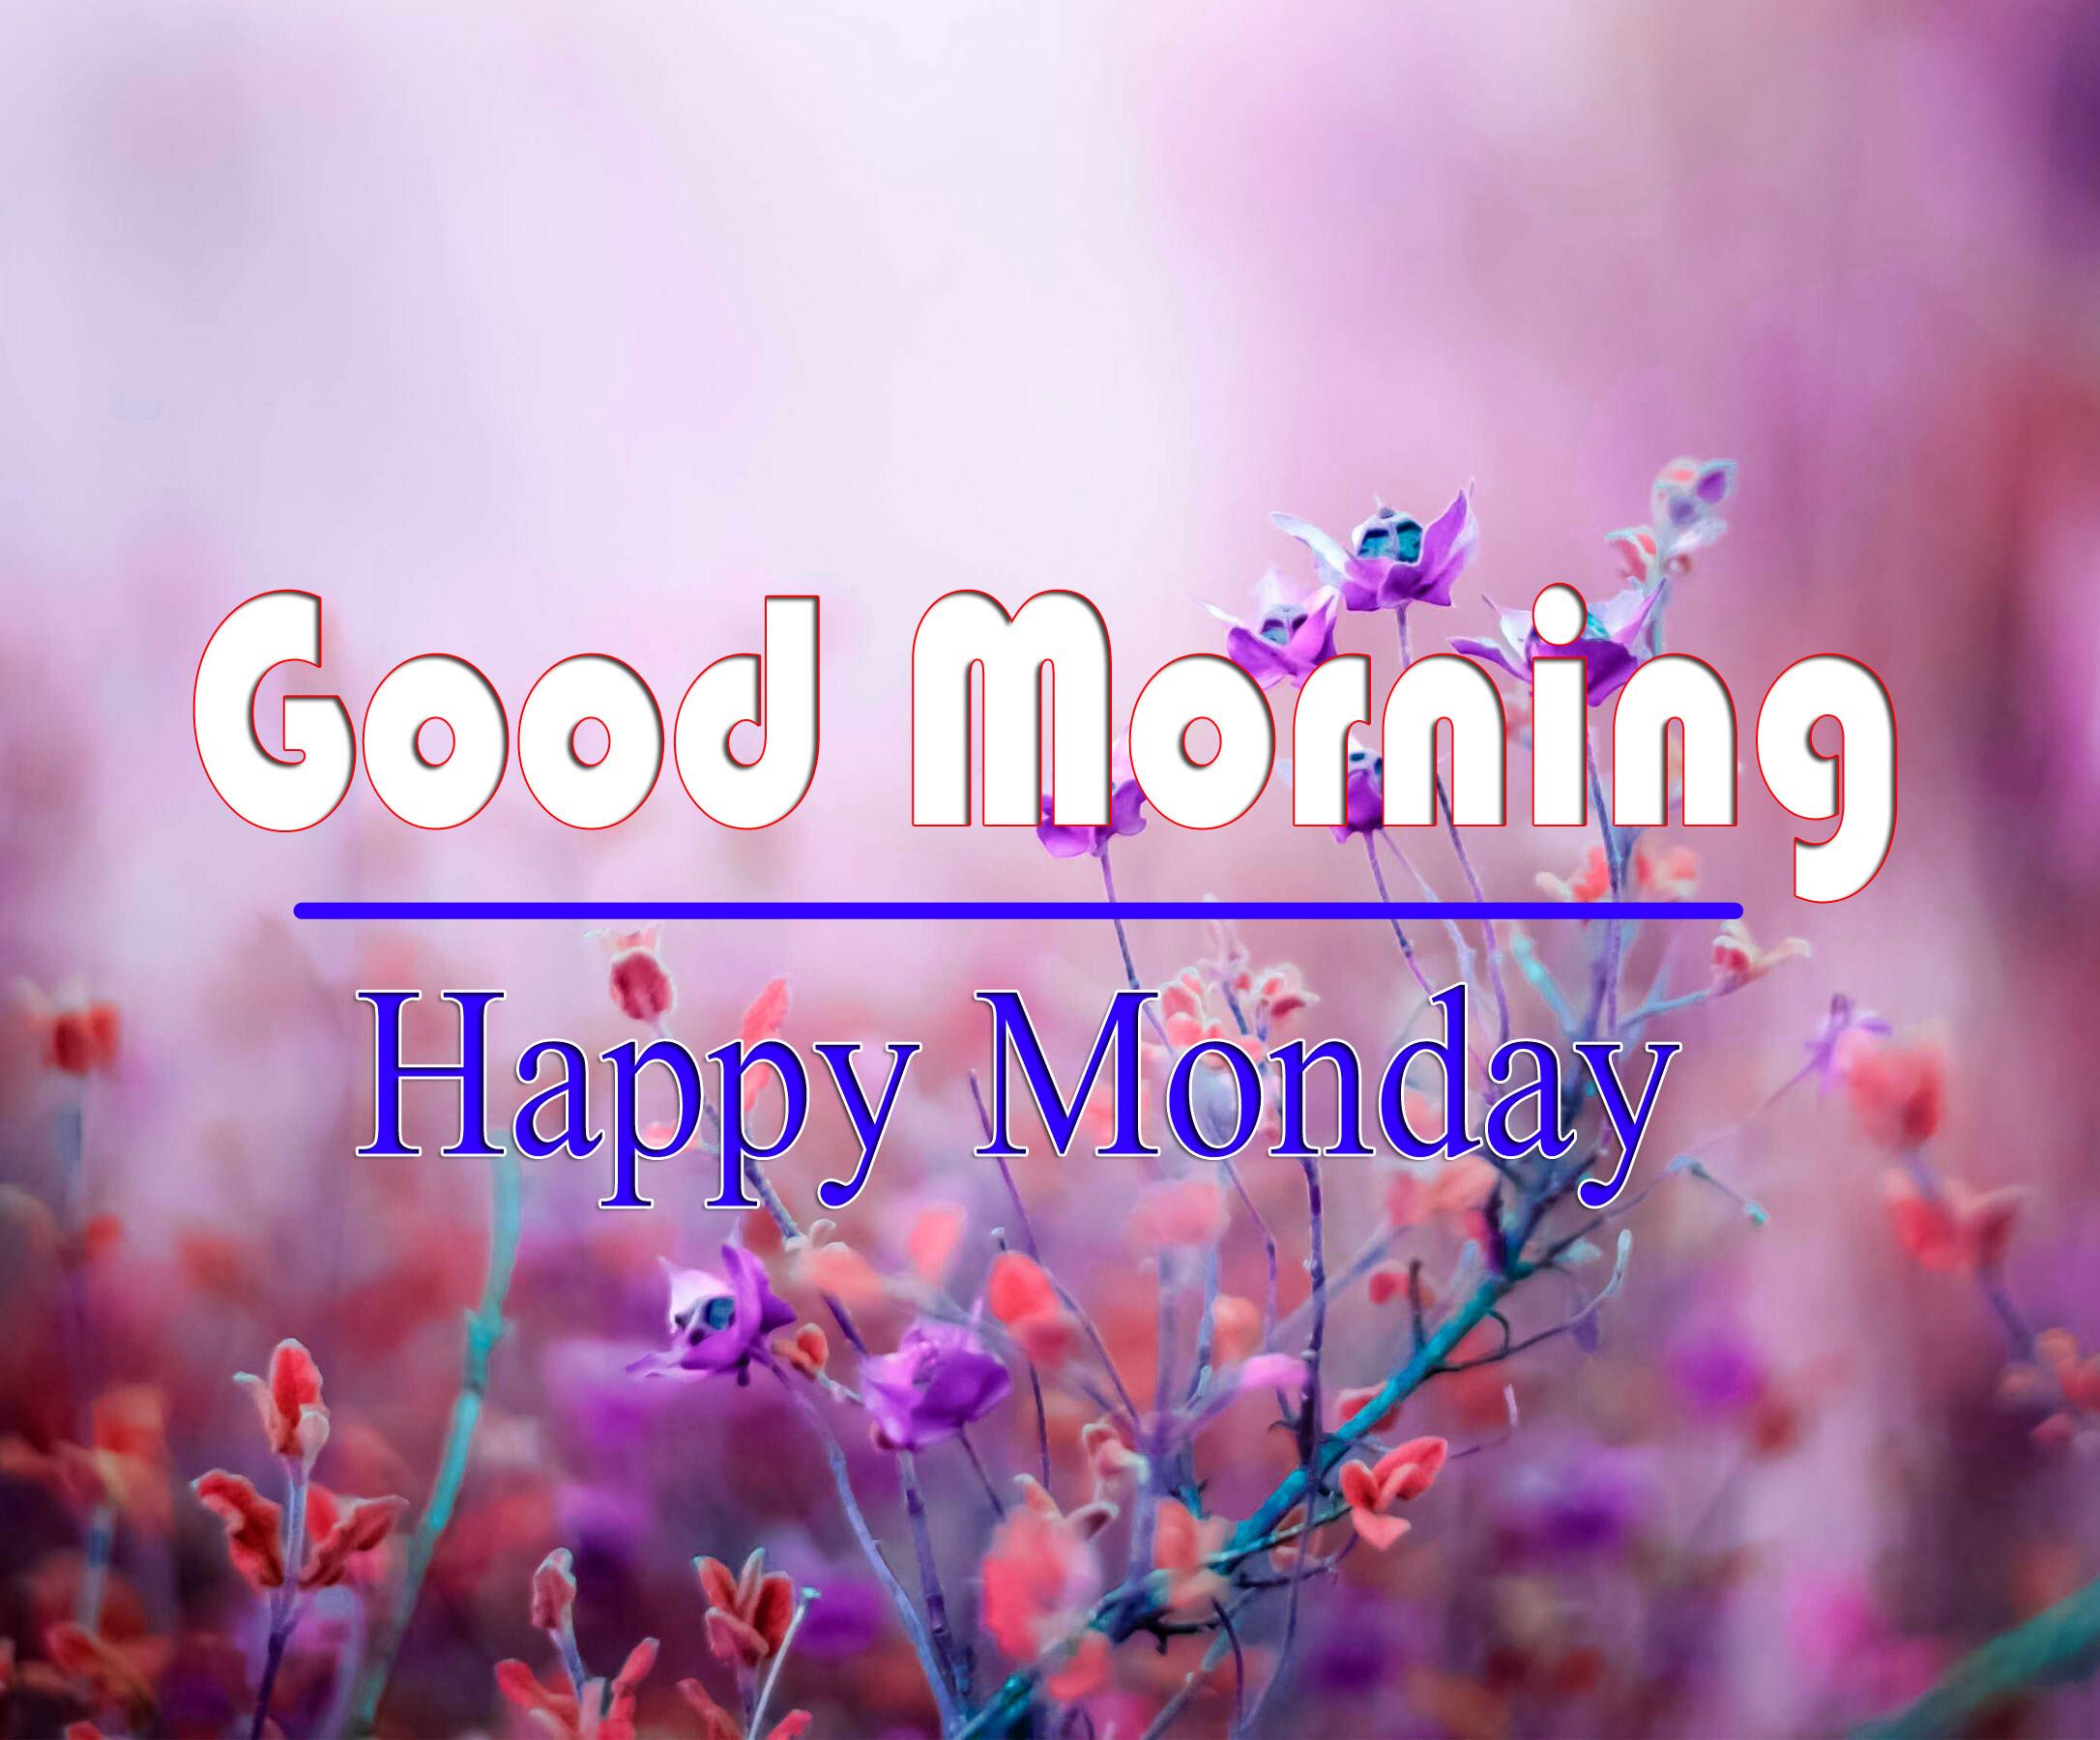 Monday Good Morning Pics Free 1